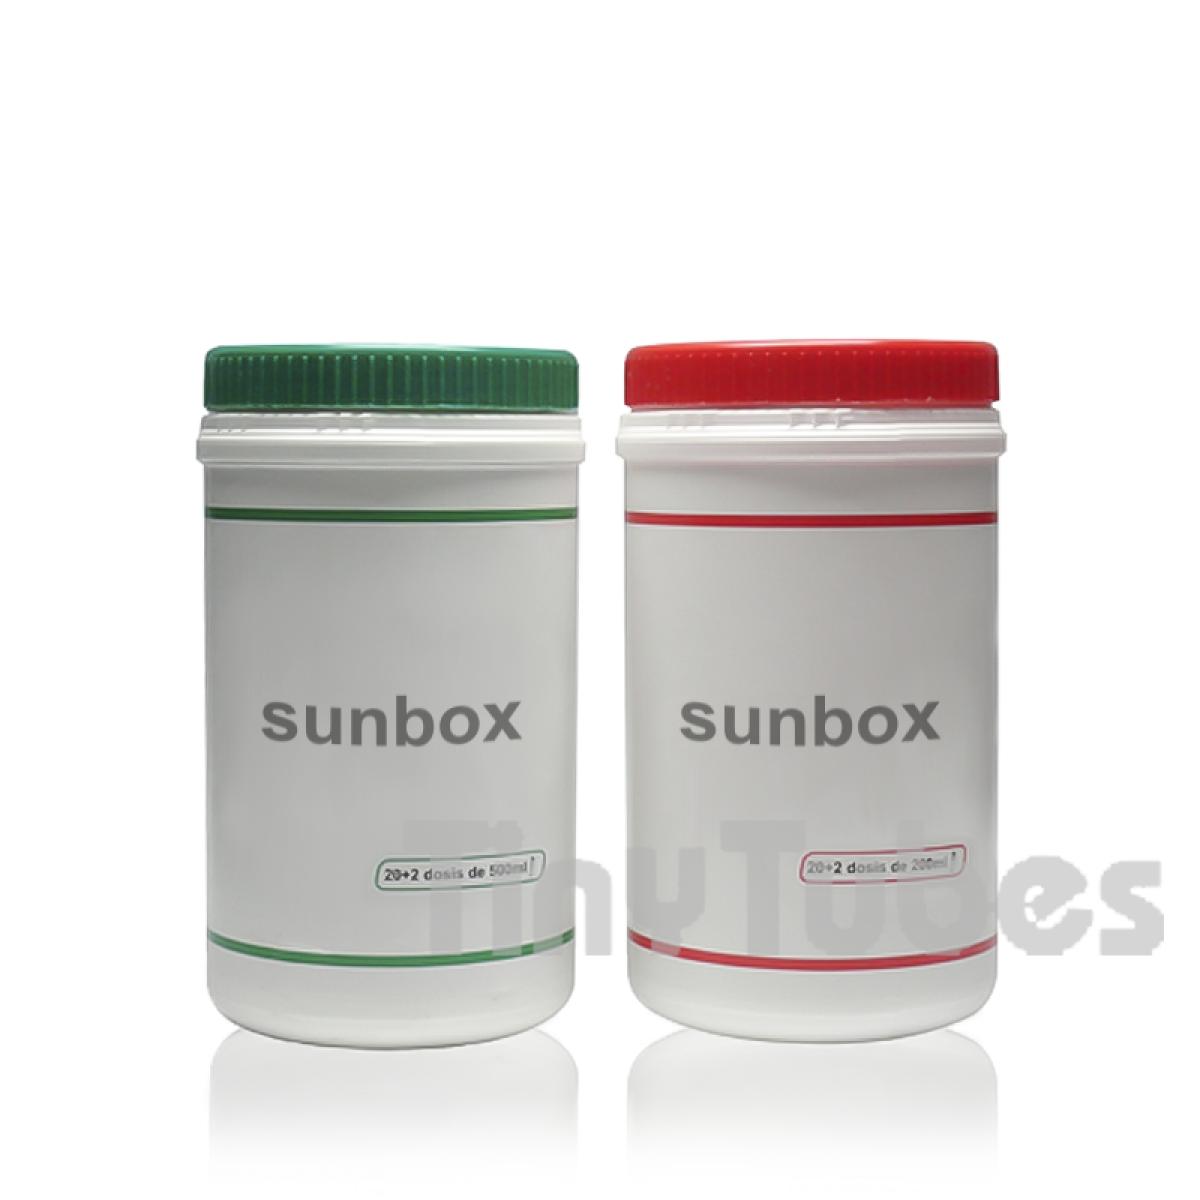 sunbox_prod_3